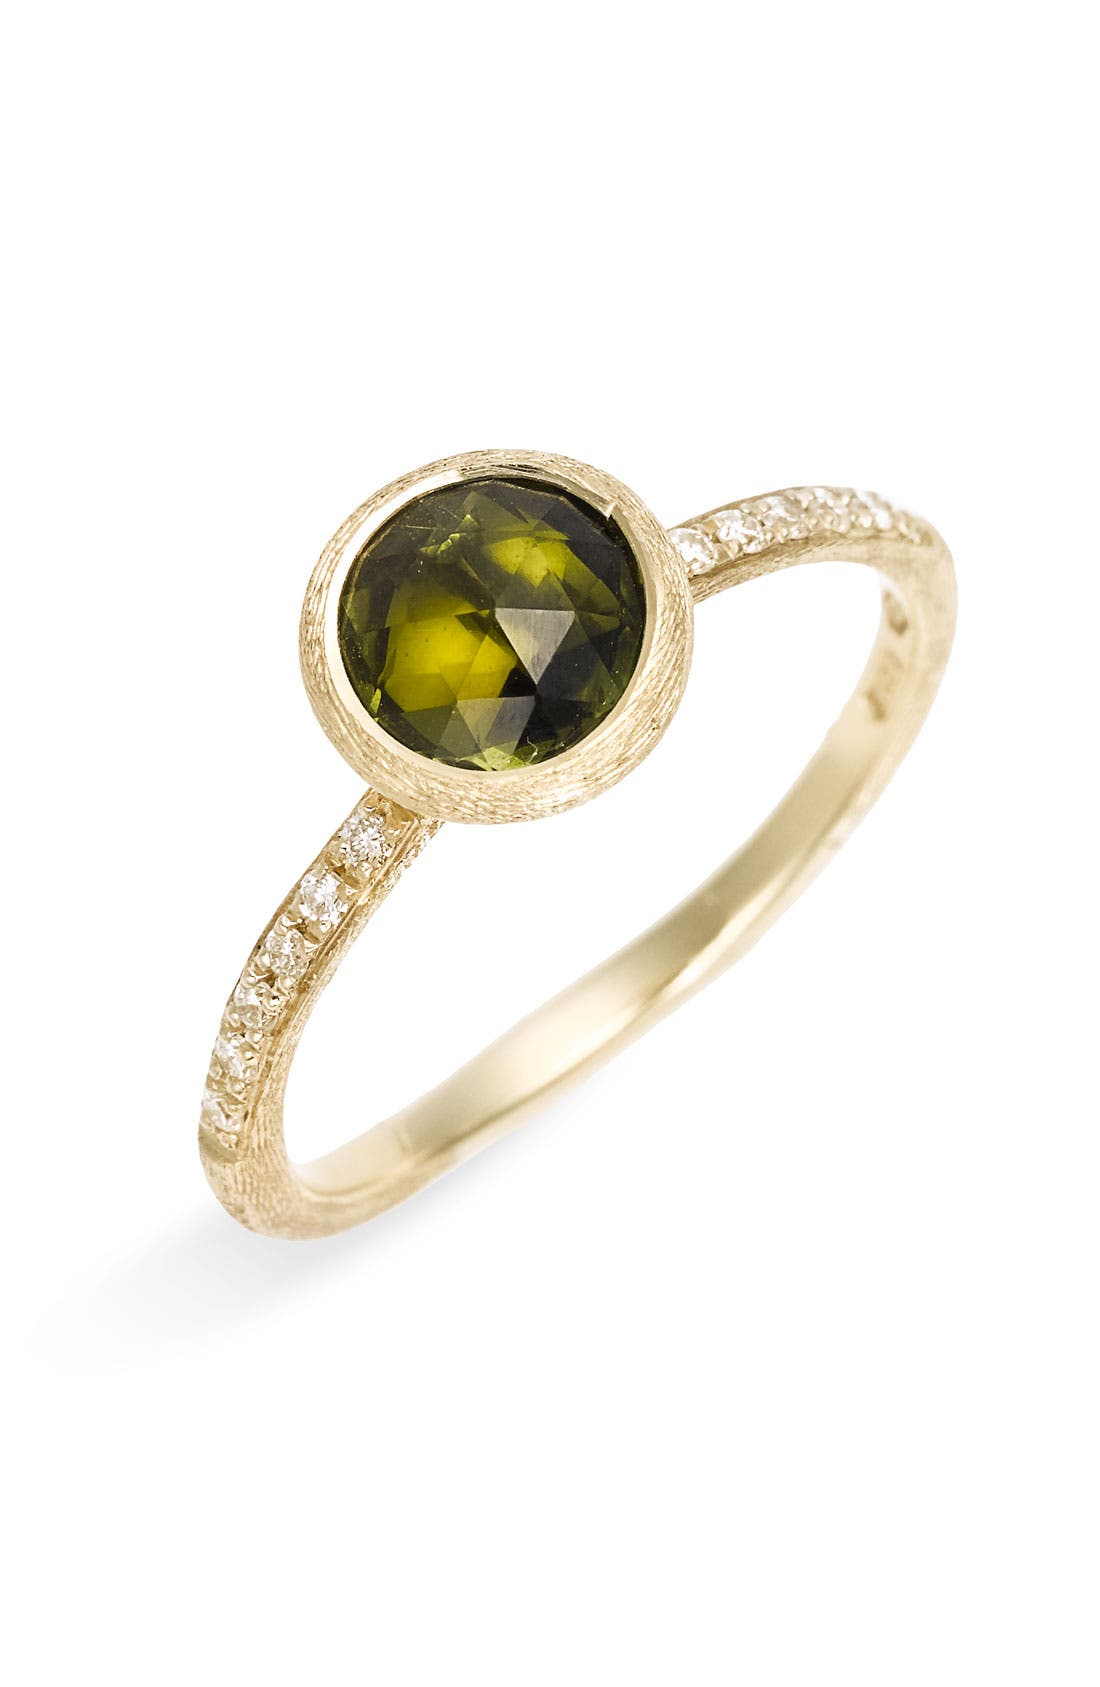 Main Image - Marco Bicego 'Jaipur' Tourmaline & Pavé Diamond Stackable Ring